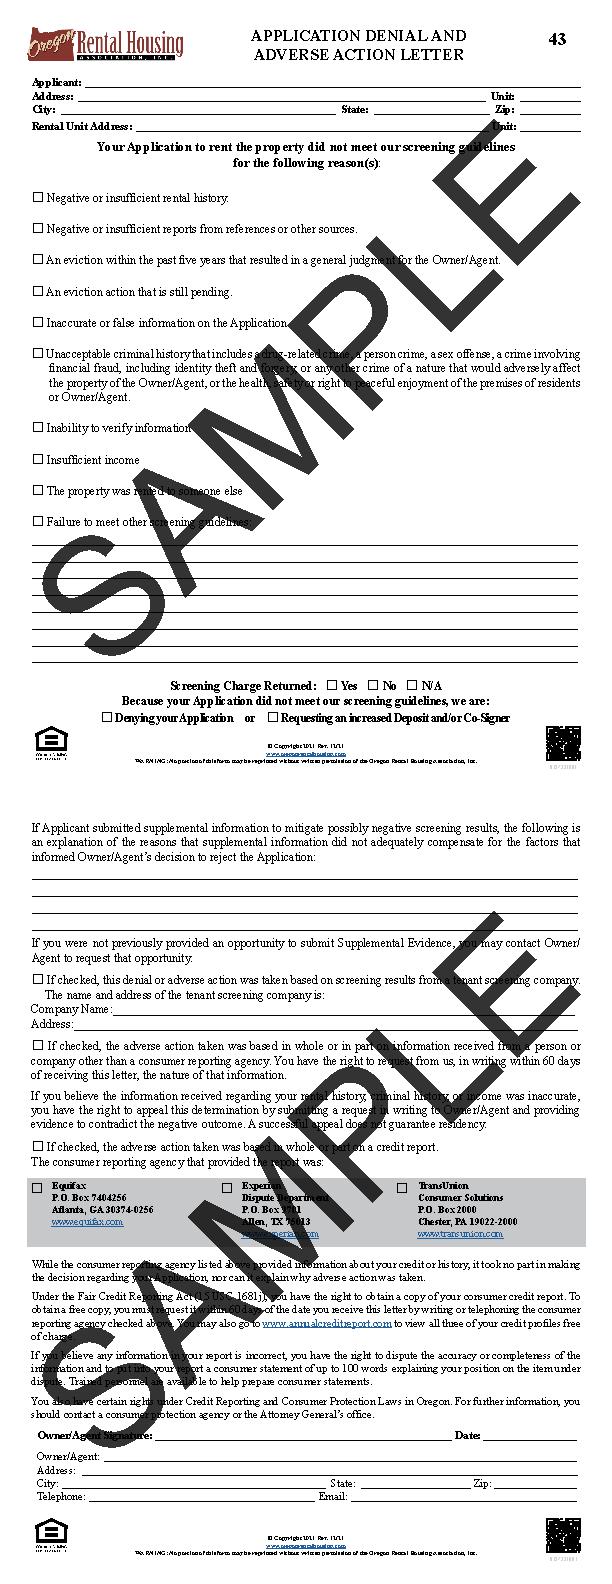 Oregon Rental Housing Association Choose Your Form